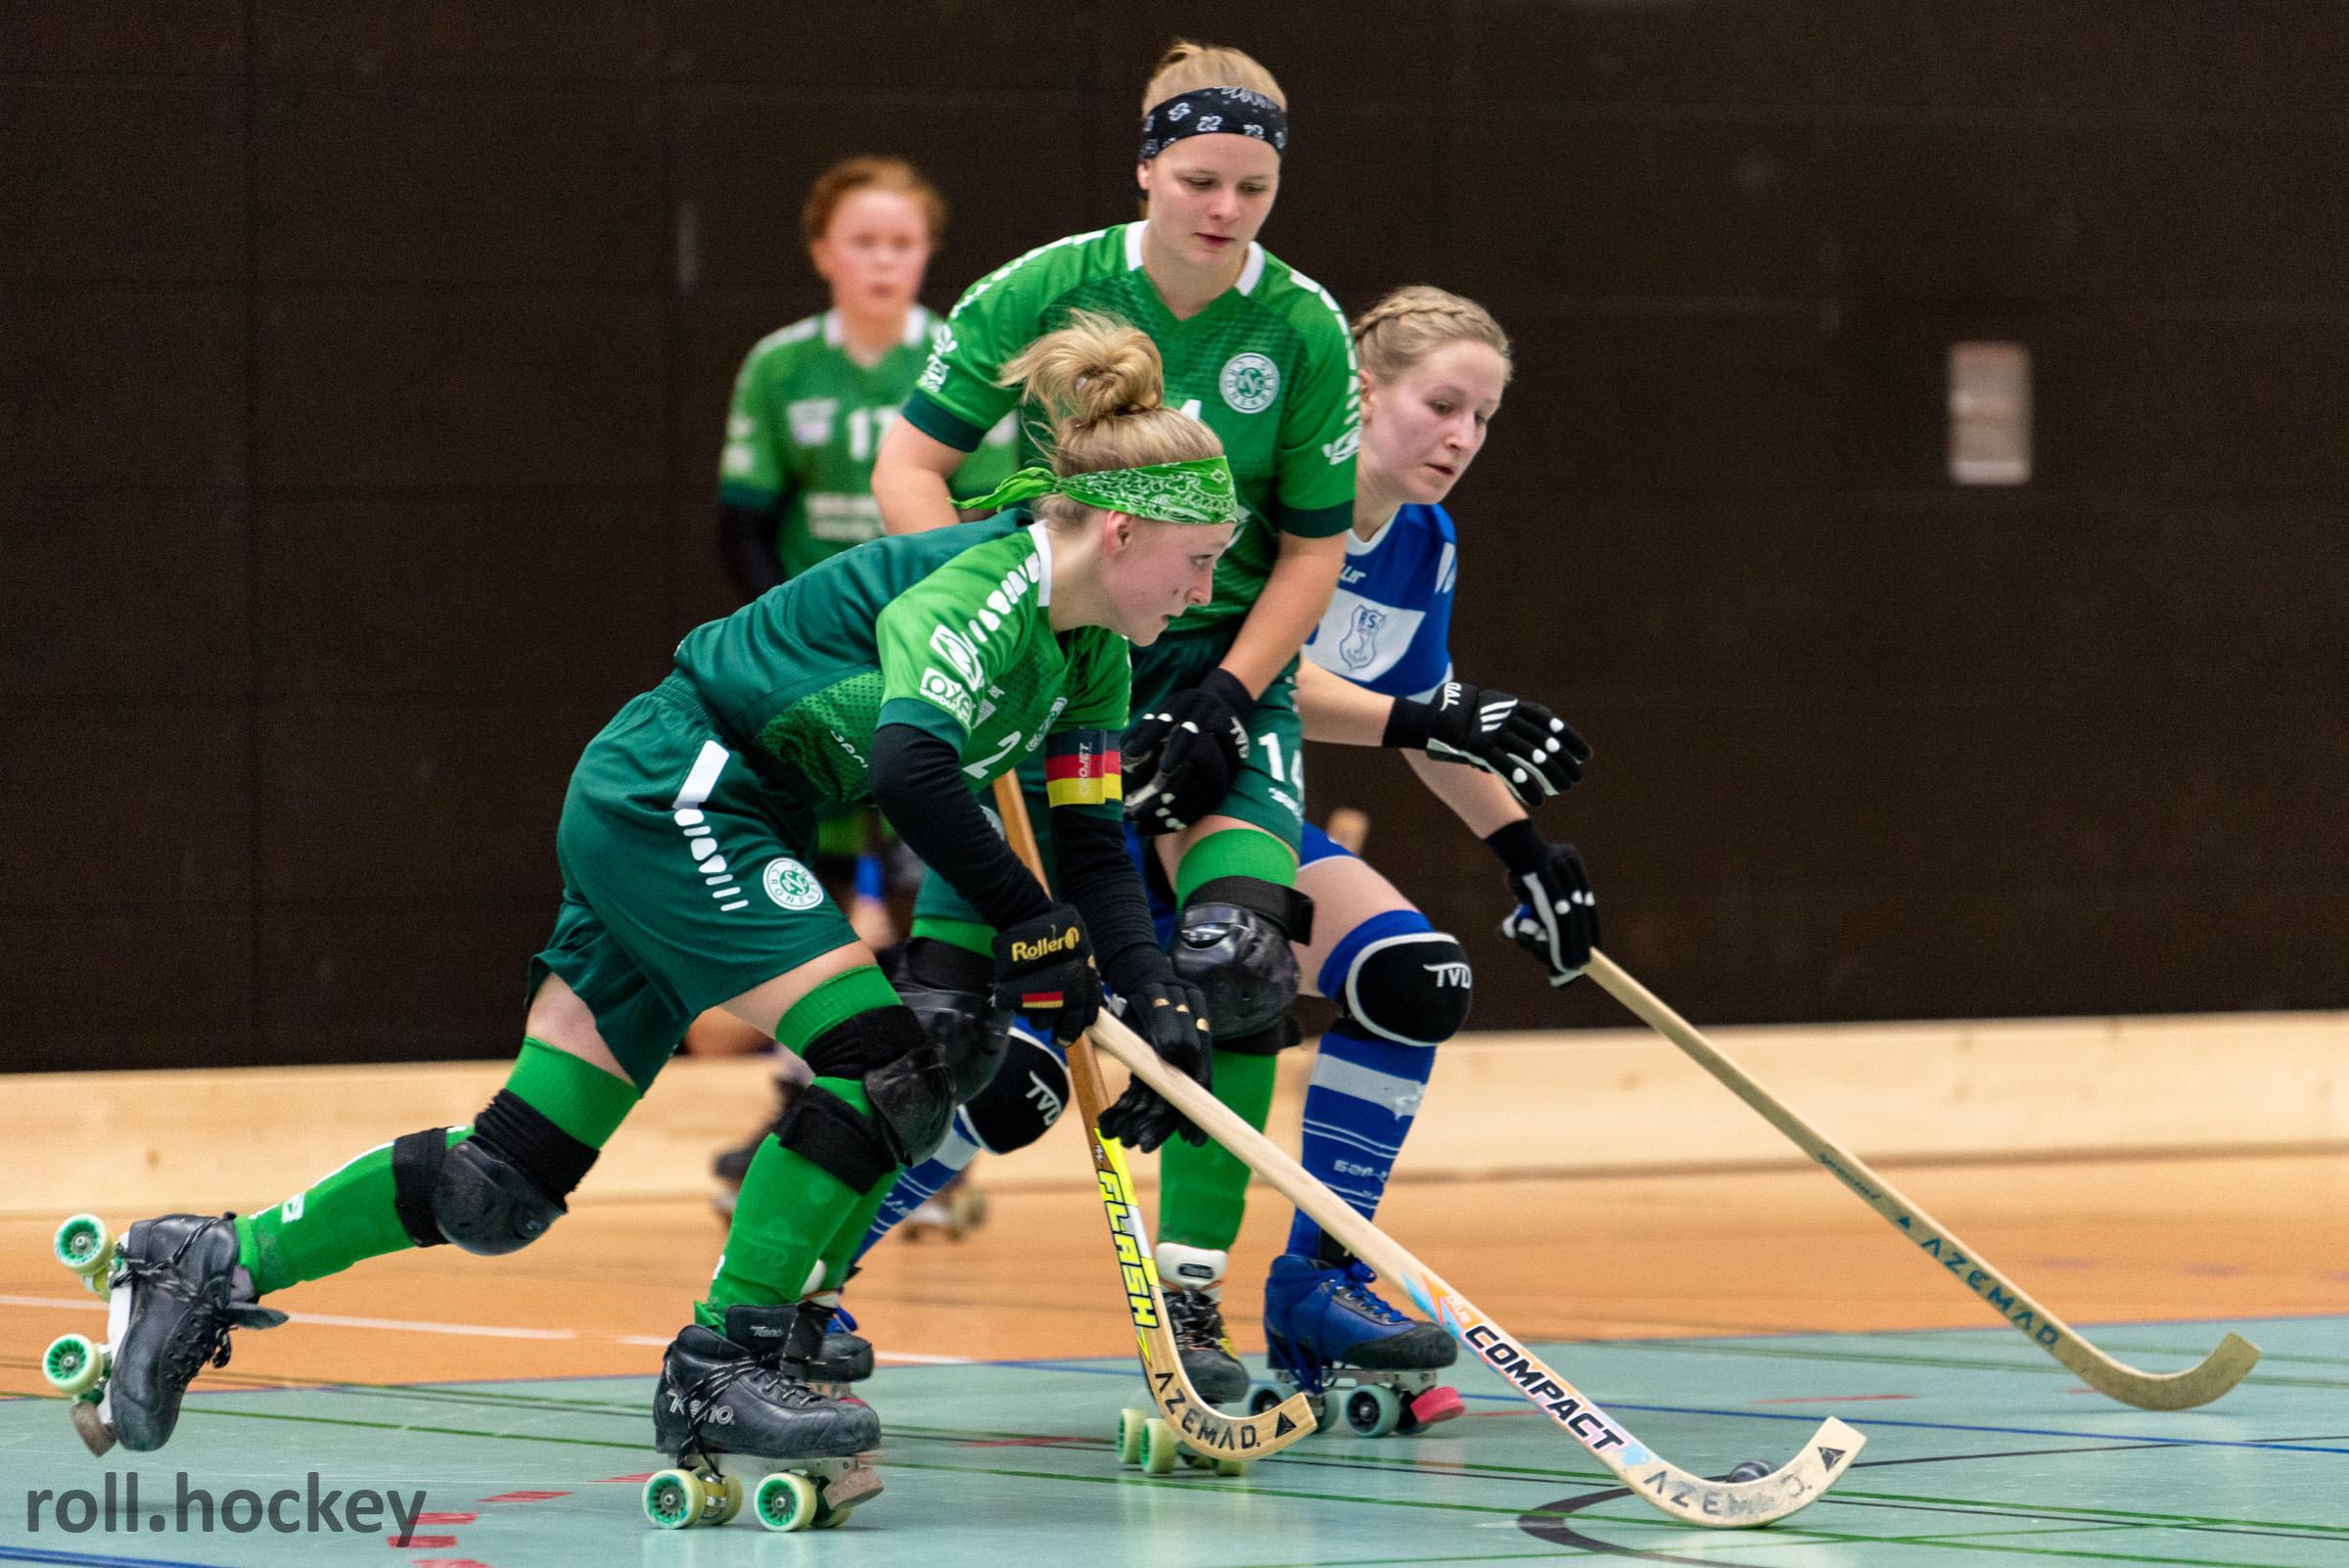 RSC Cronenberg DRIV-Pokal Viertelfinale Damen 30.11.2019